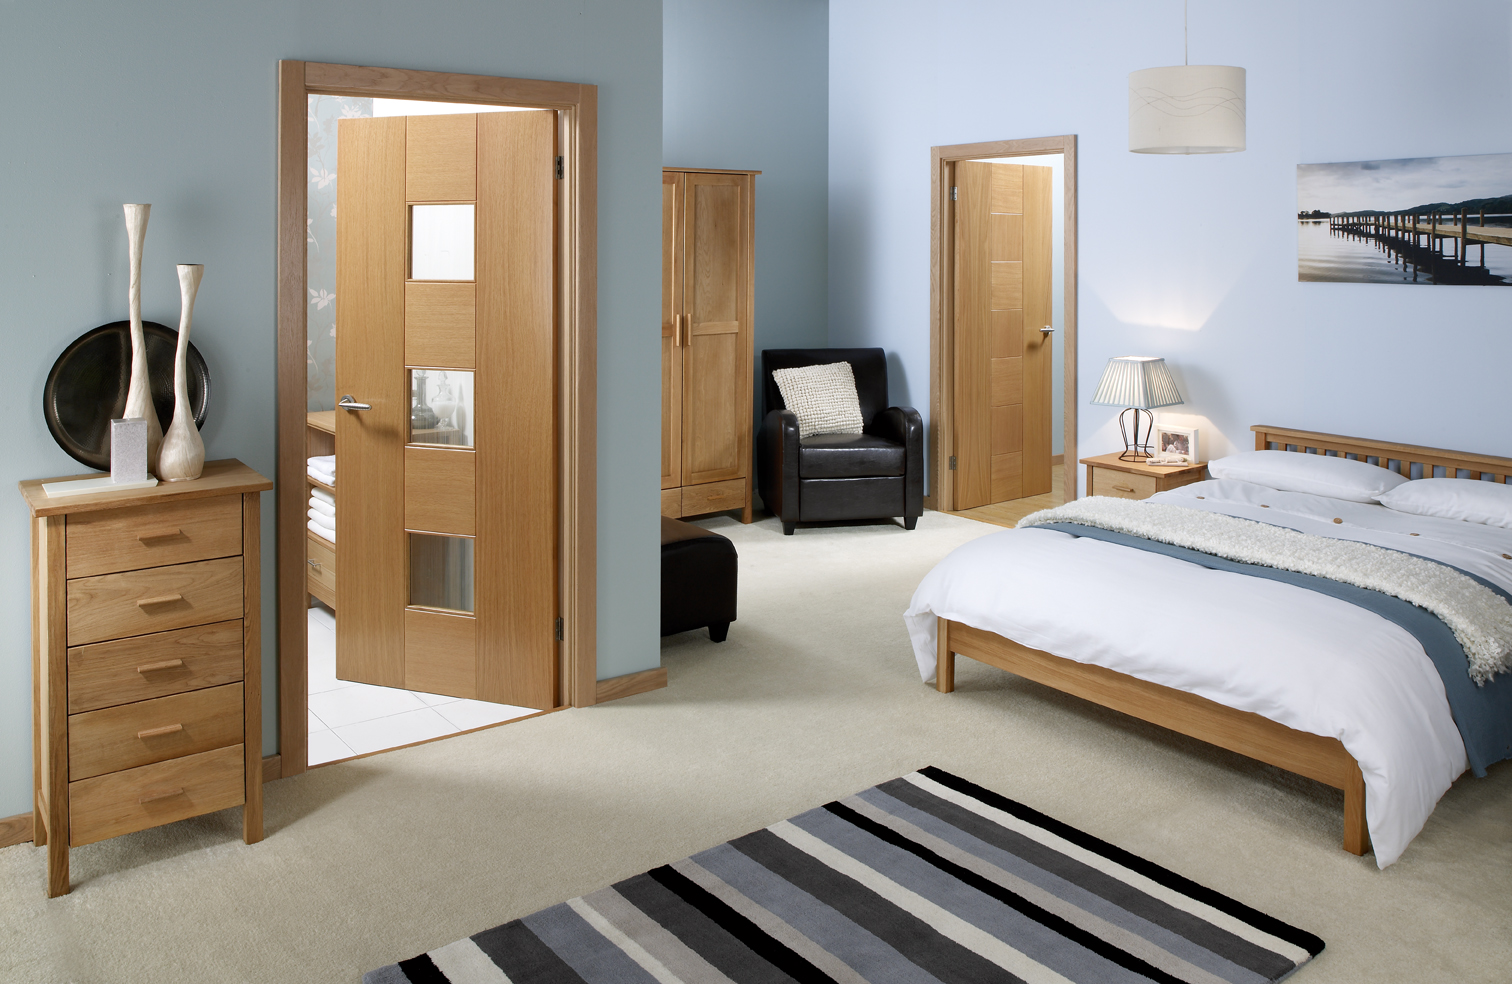 Stylish Wood Bedroom Design Ideas 2014 - modern Bedrooms design ideas ...